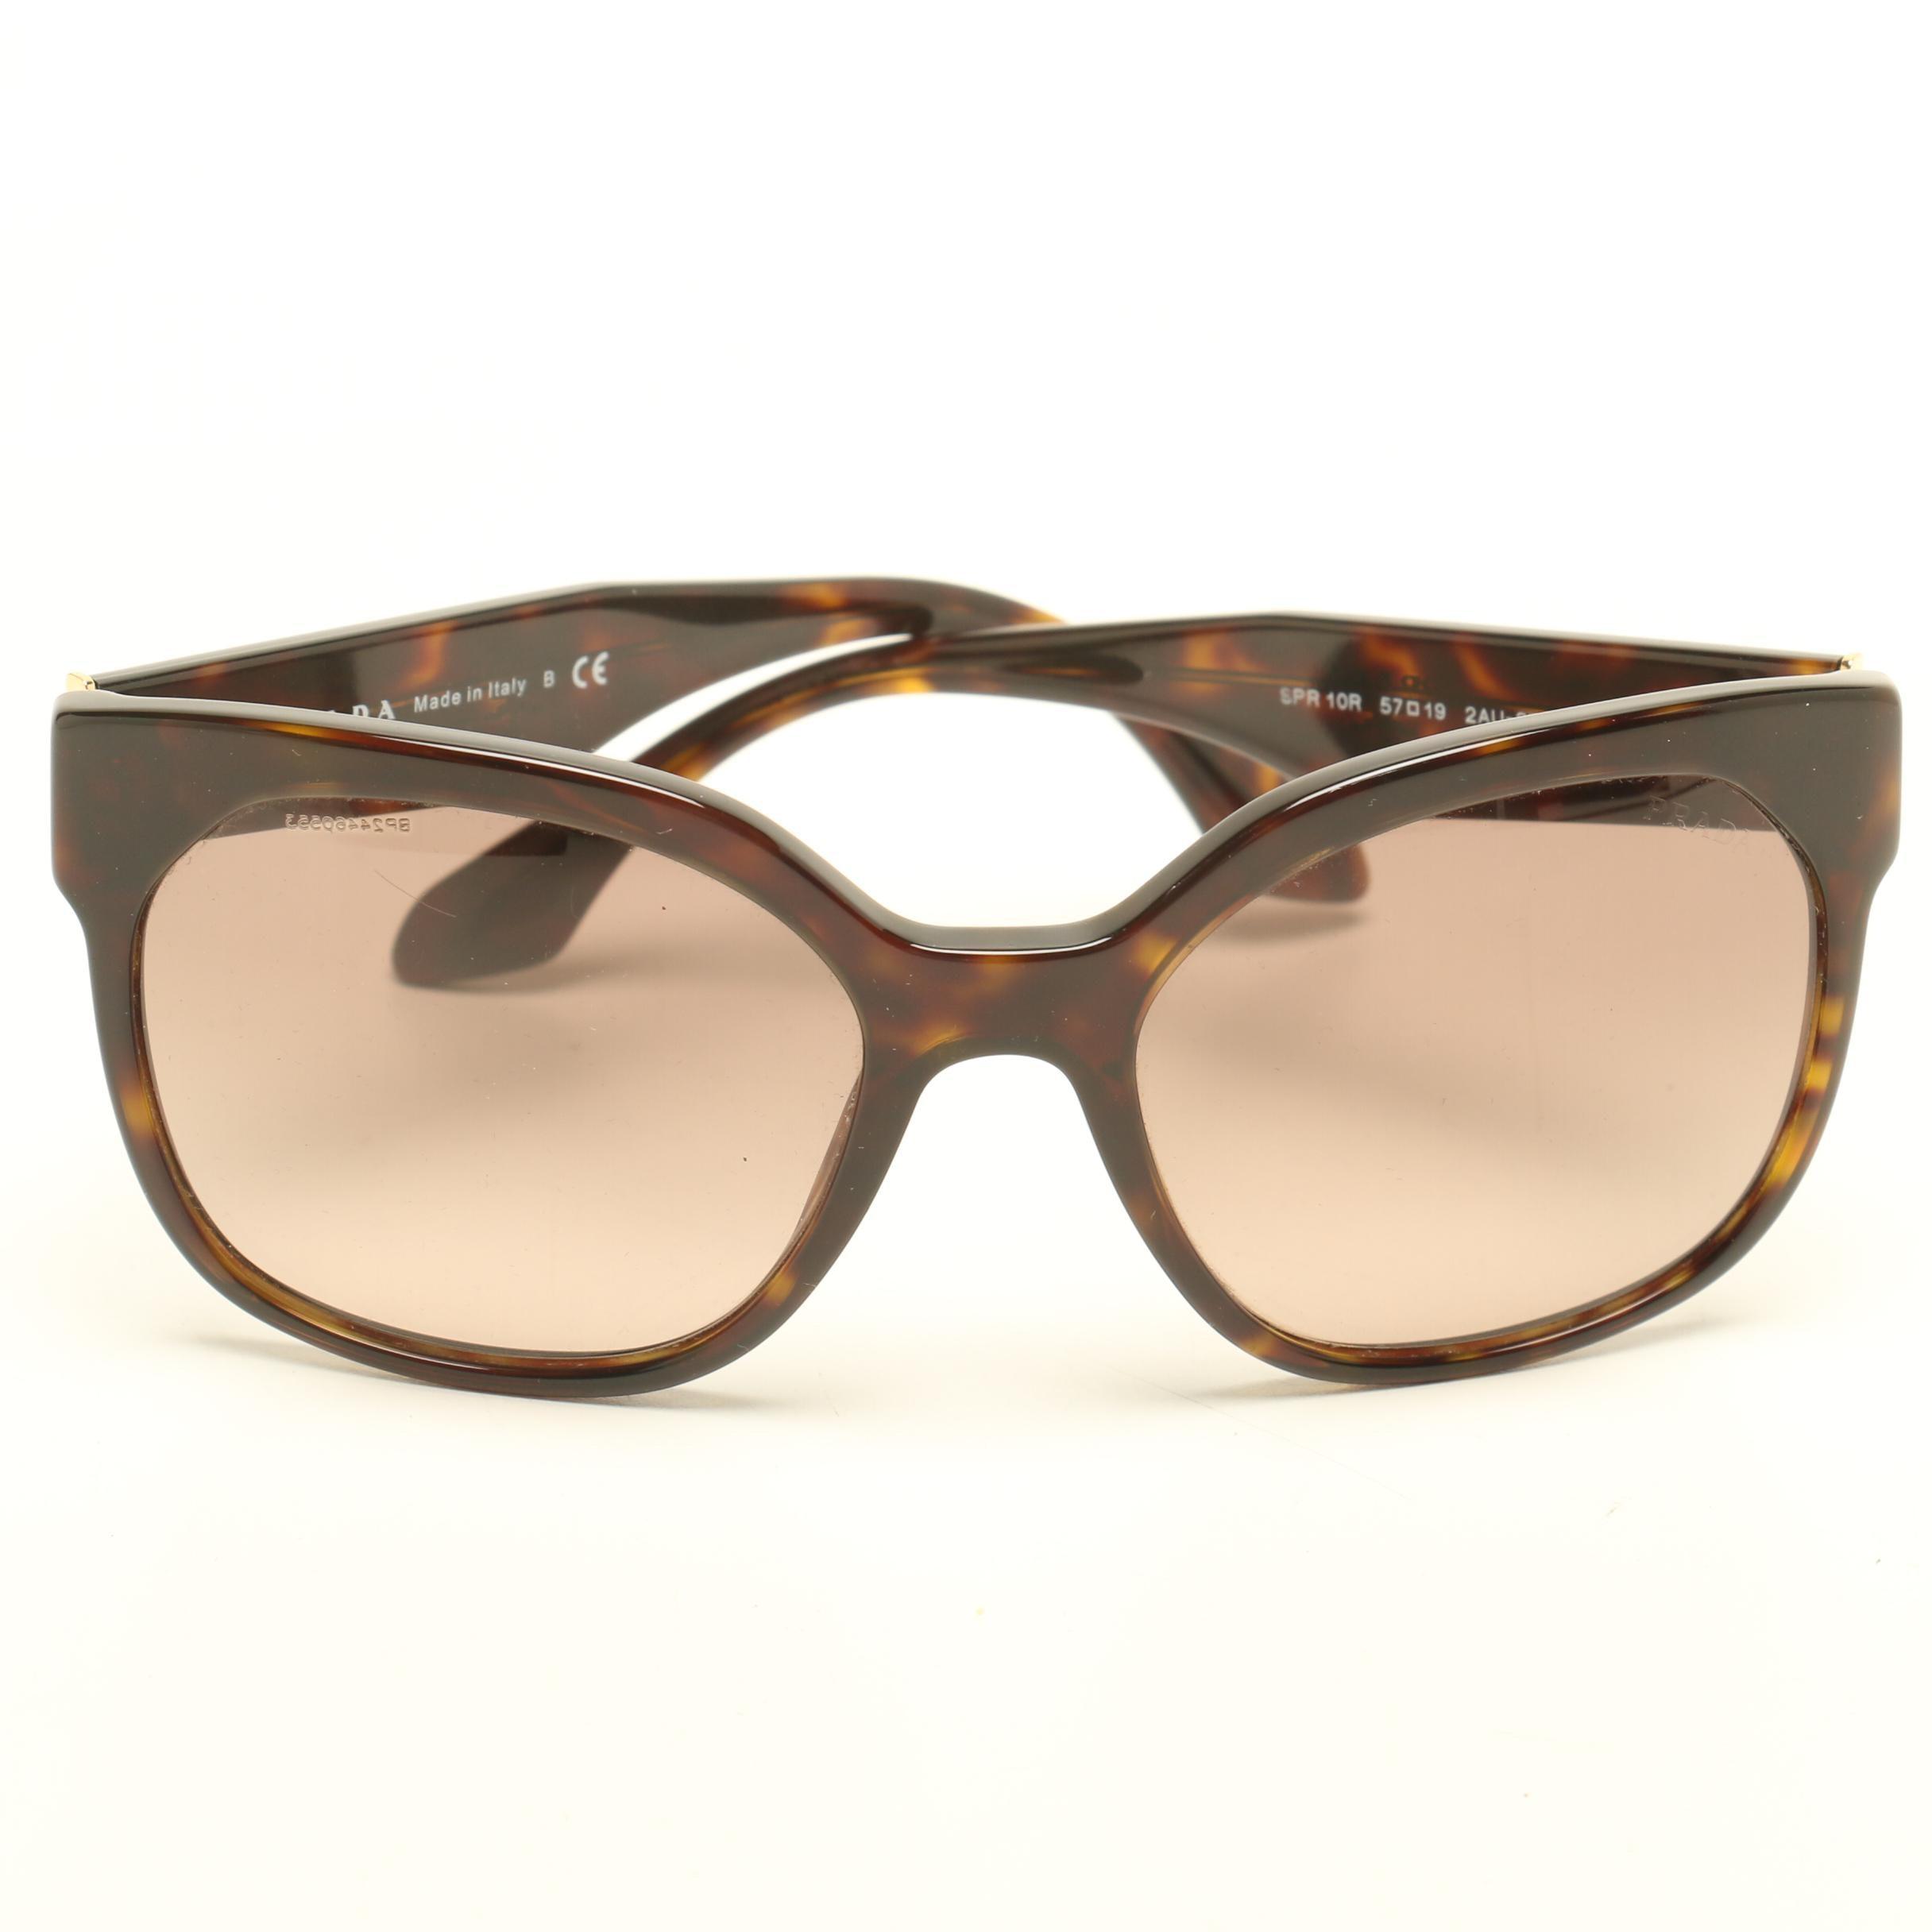 Prada Tortoiseshell-Style Modified Cat Eye Designer Sunglasses